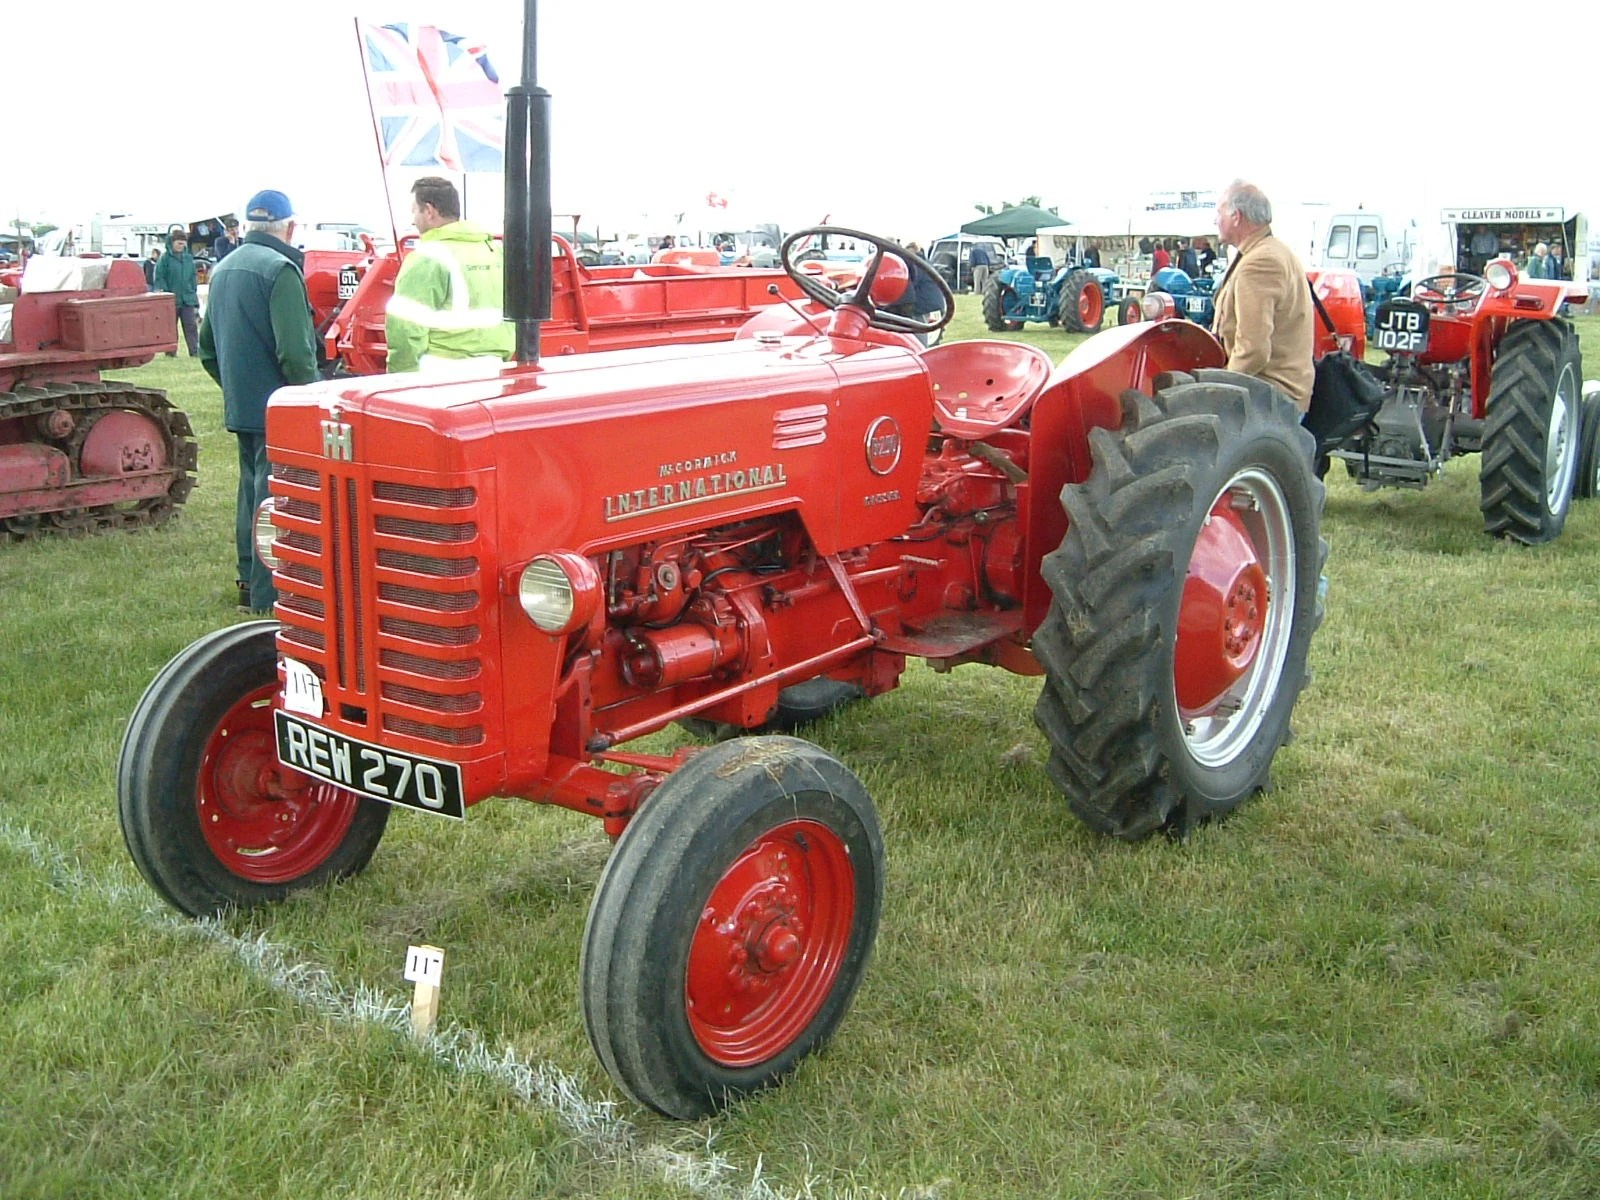 Rew 270 Tractor & Construction Plant Wiki Fandom